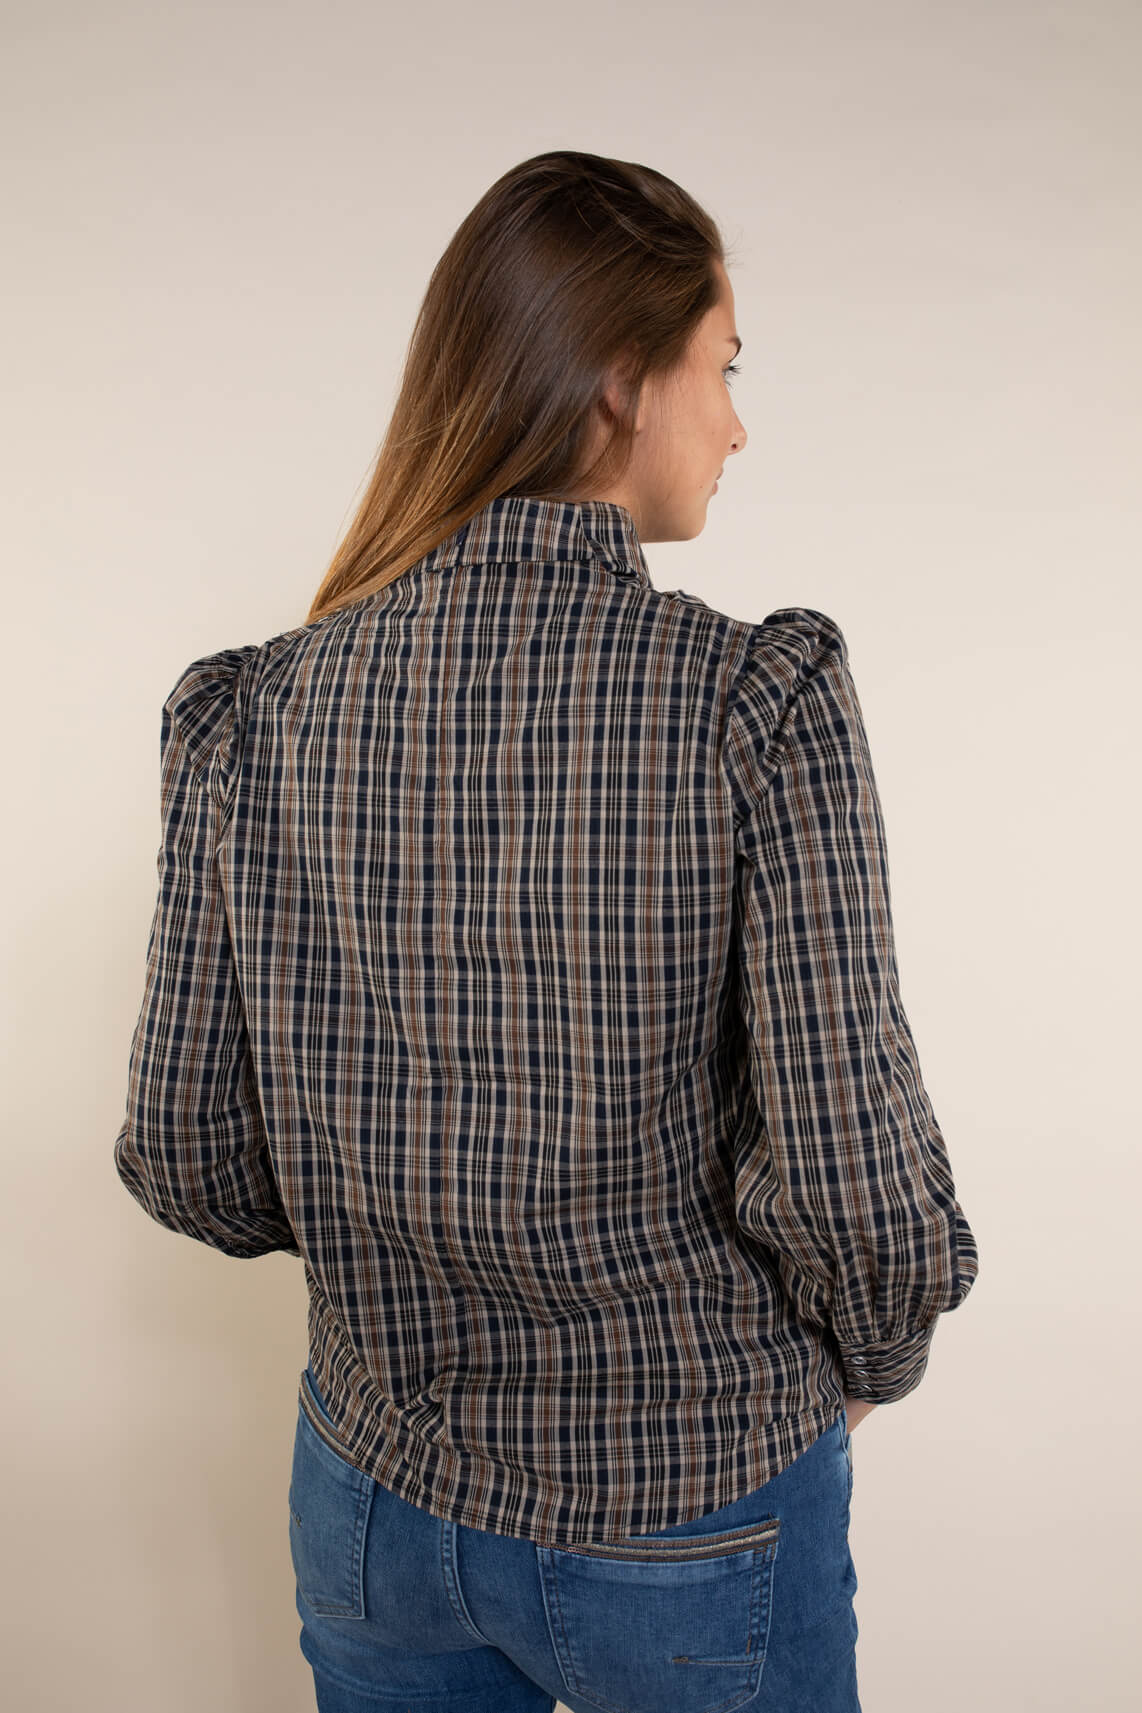 Co Couture Dames Scot geruite blouse Bruin